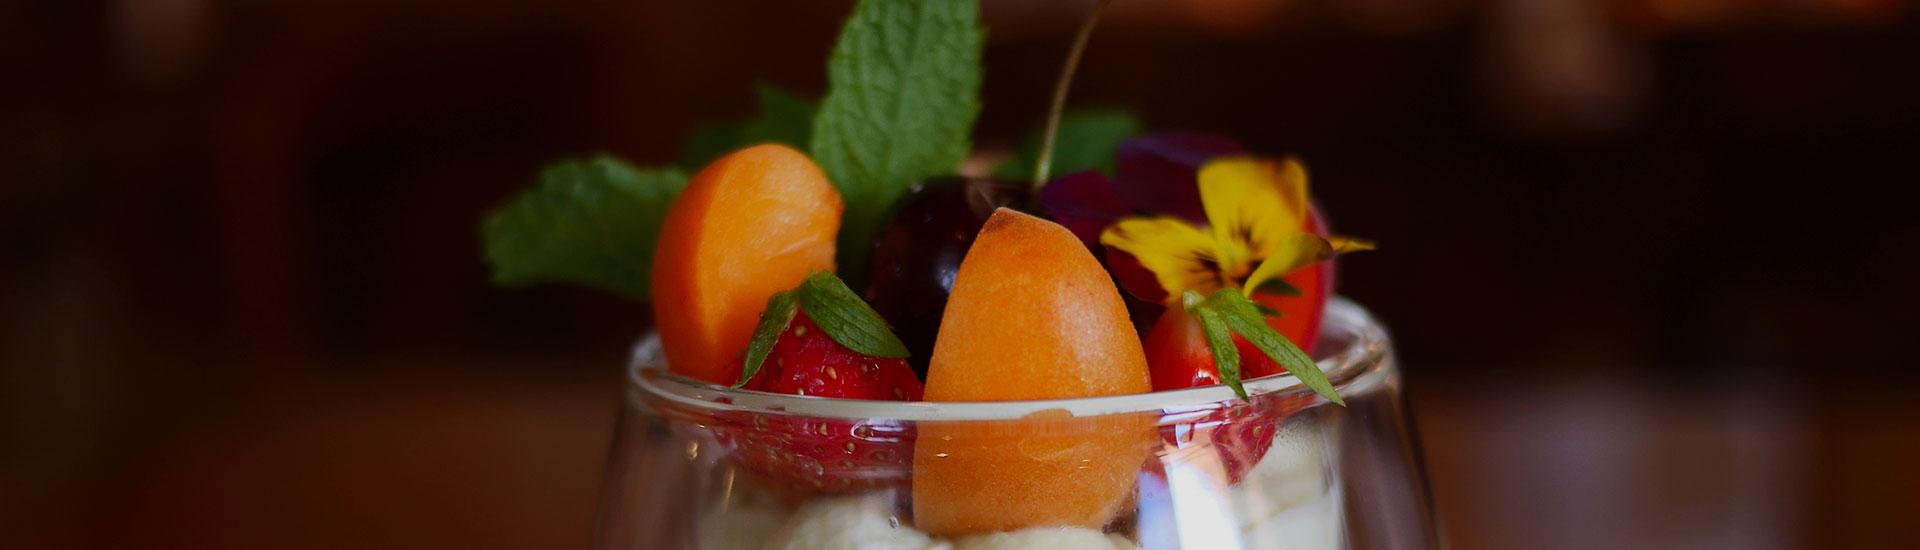 Dessert Auberge de Gilly